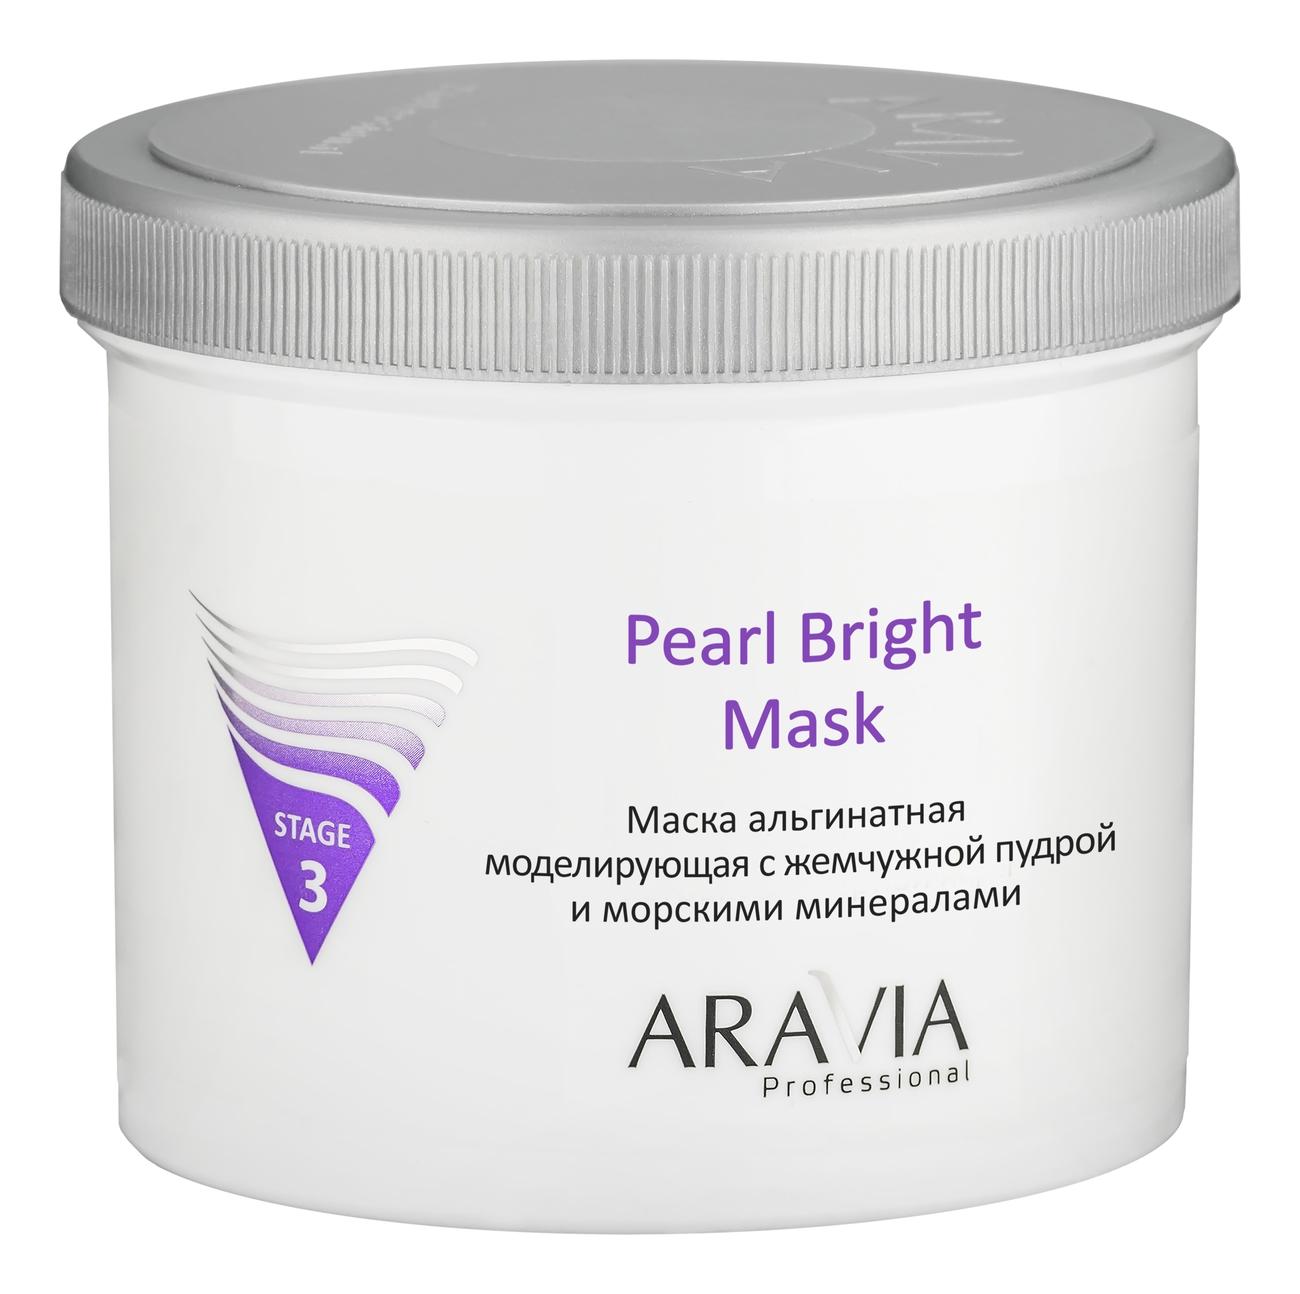 Маска альгинатная моделирующая Pearl Bright Mask Stage 3 550мл моделирующая маска